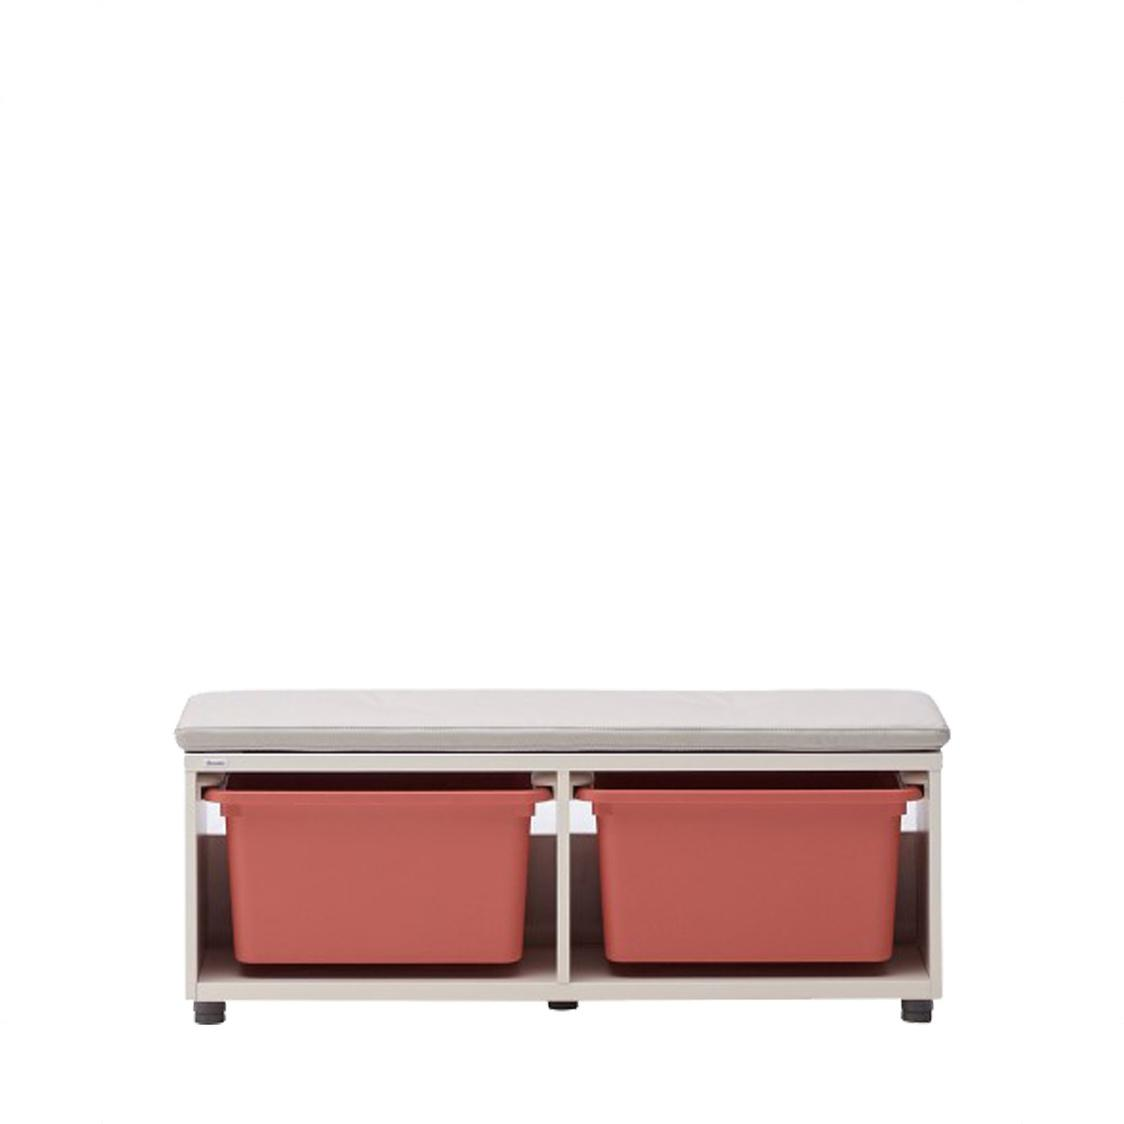 Iloom Eddi Kids 950W Bench With Storage Hsfp191-Ivkr